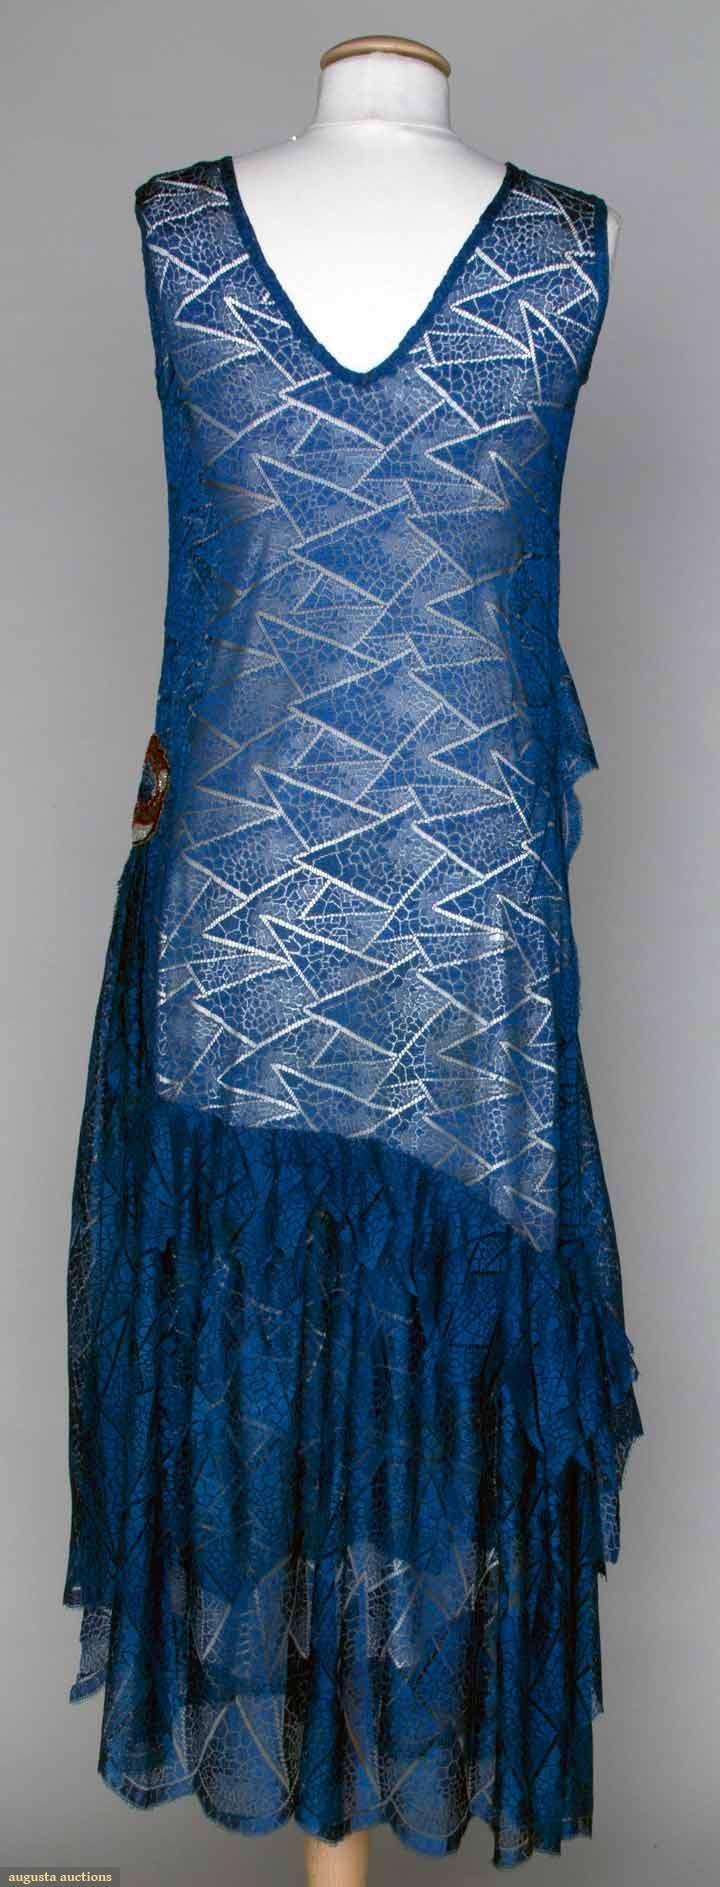 best ooooh pretty s dresses images on pinterest vintage